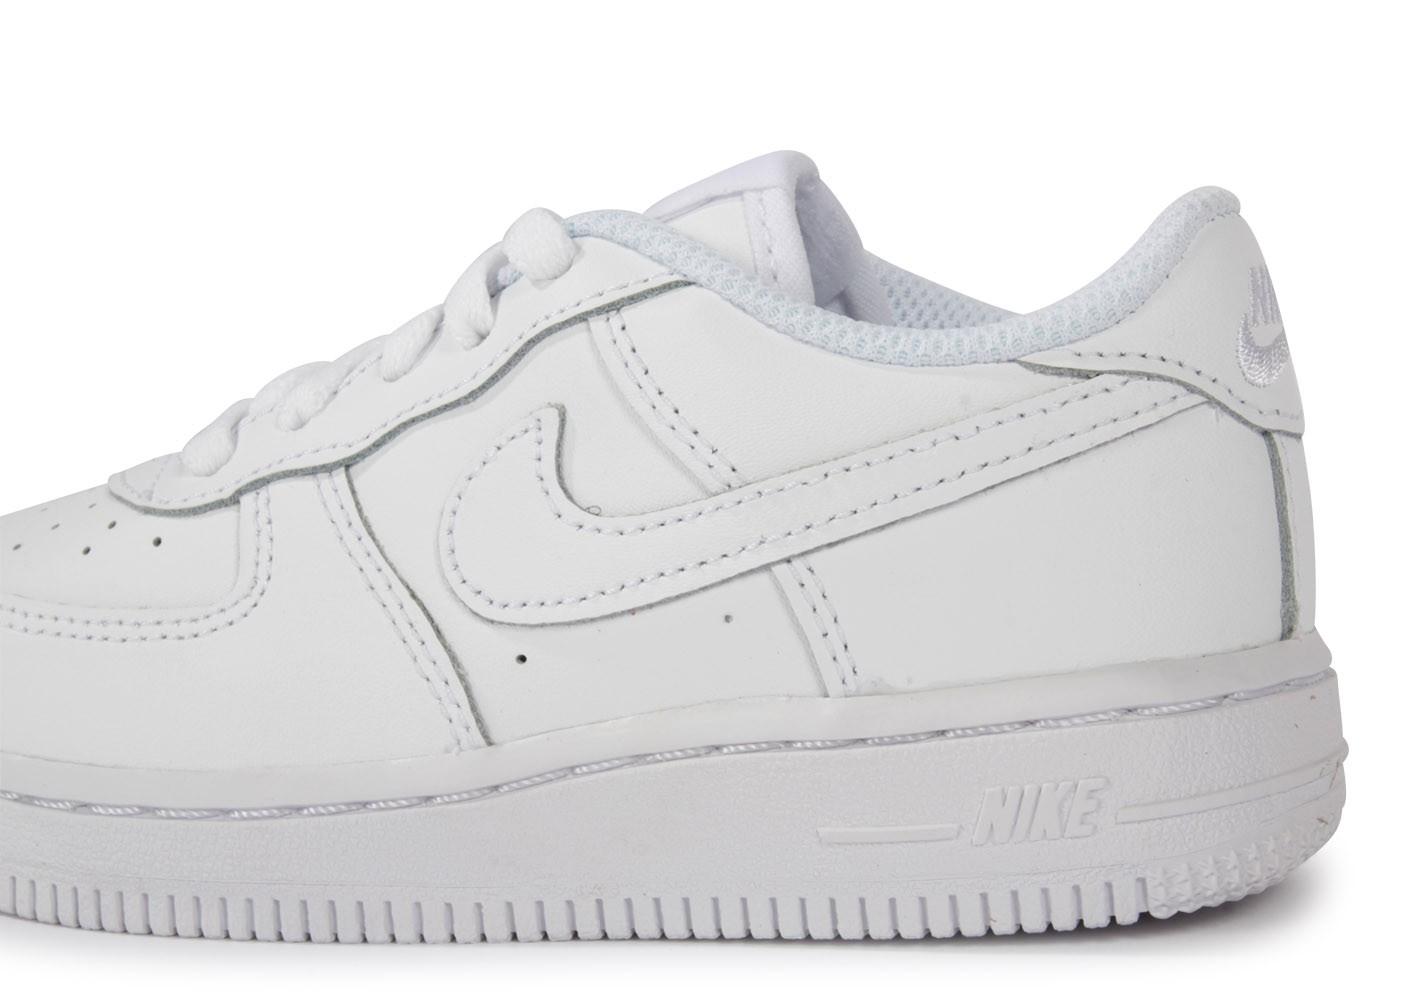 plus récent 988dd 2e86e mercurial puma chaussures chaussure adidas nike football jr ...